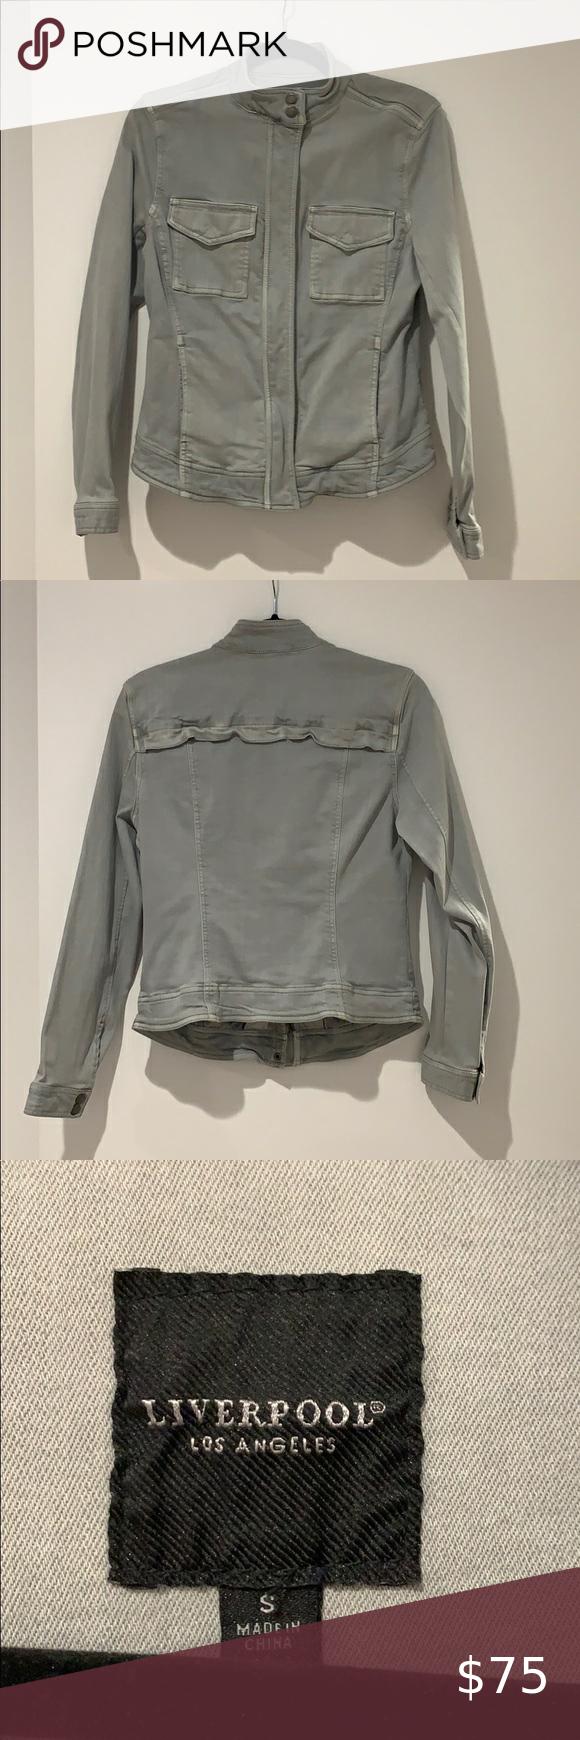 Liverpool Jeans Small Denim Jacket Liverpool Jeans Light Blue Denim Denim Jacket [ 1740 x 580 Pixel ]